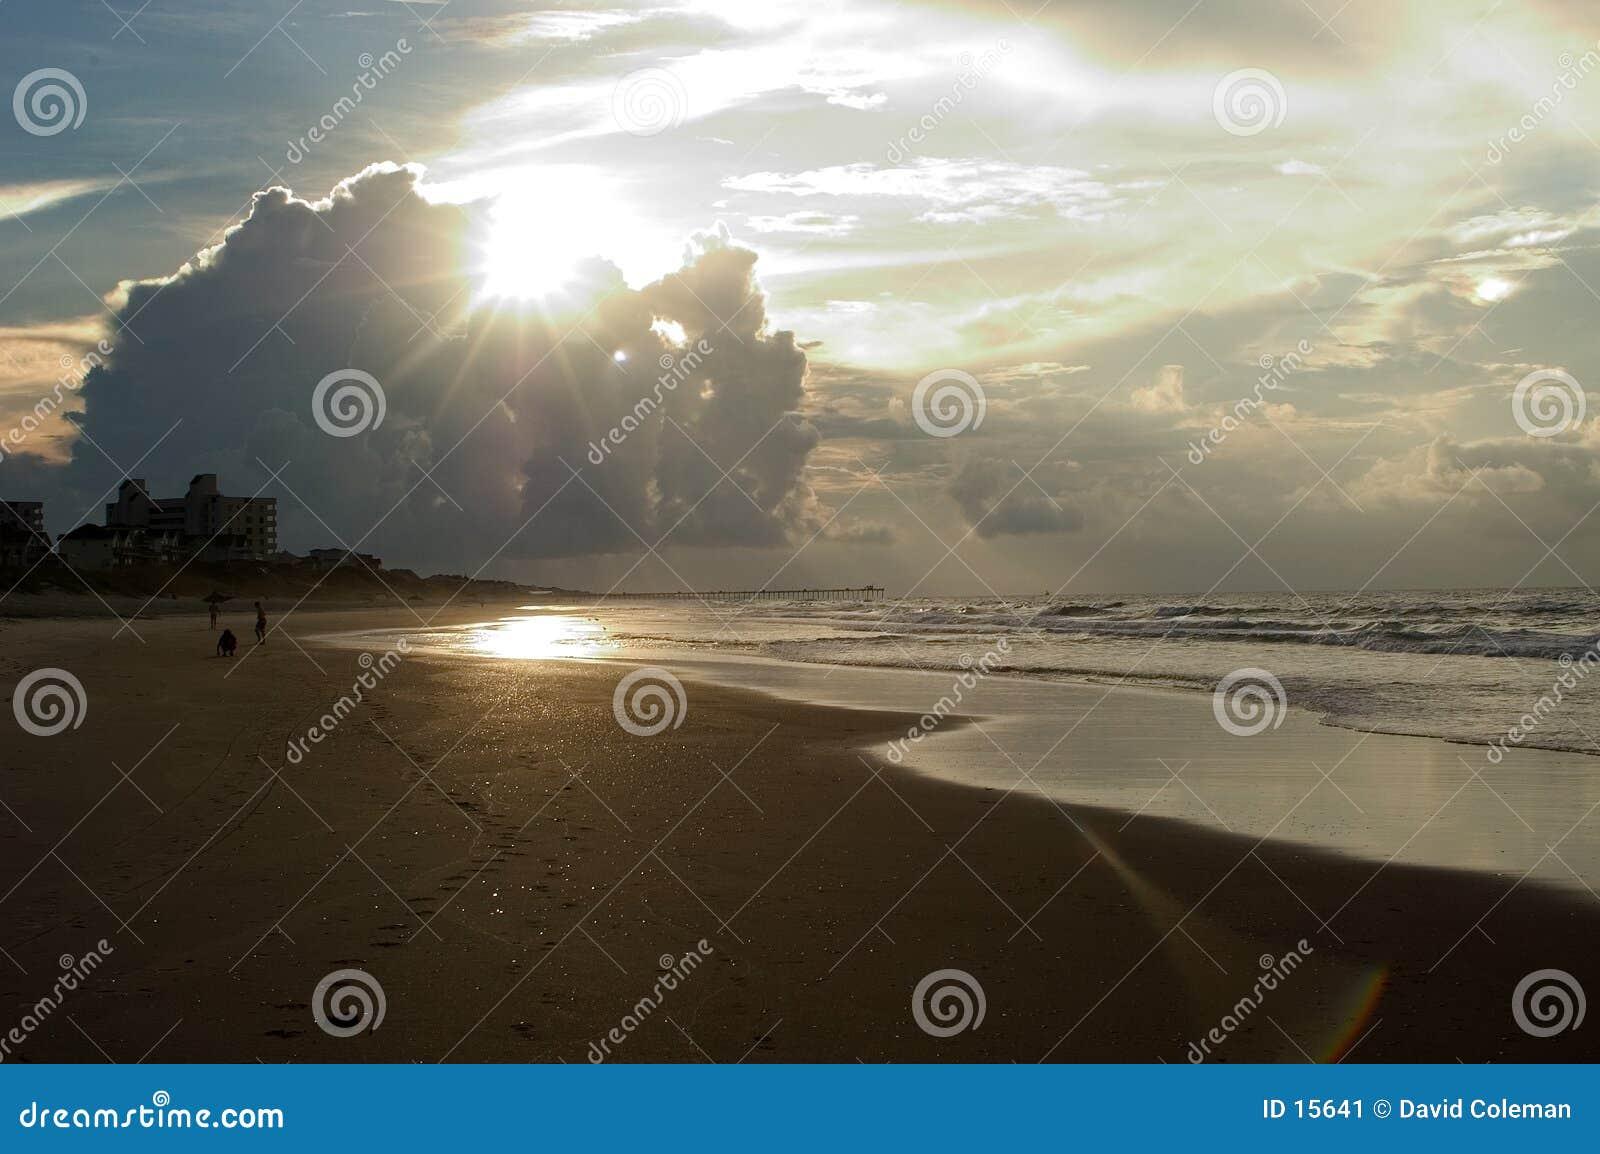 Nascer do sol, Emerald Isle, North Carolina